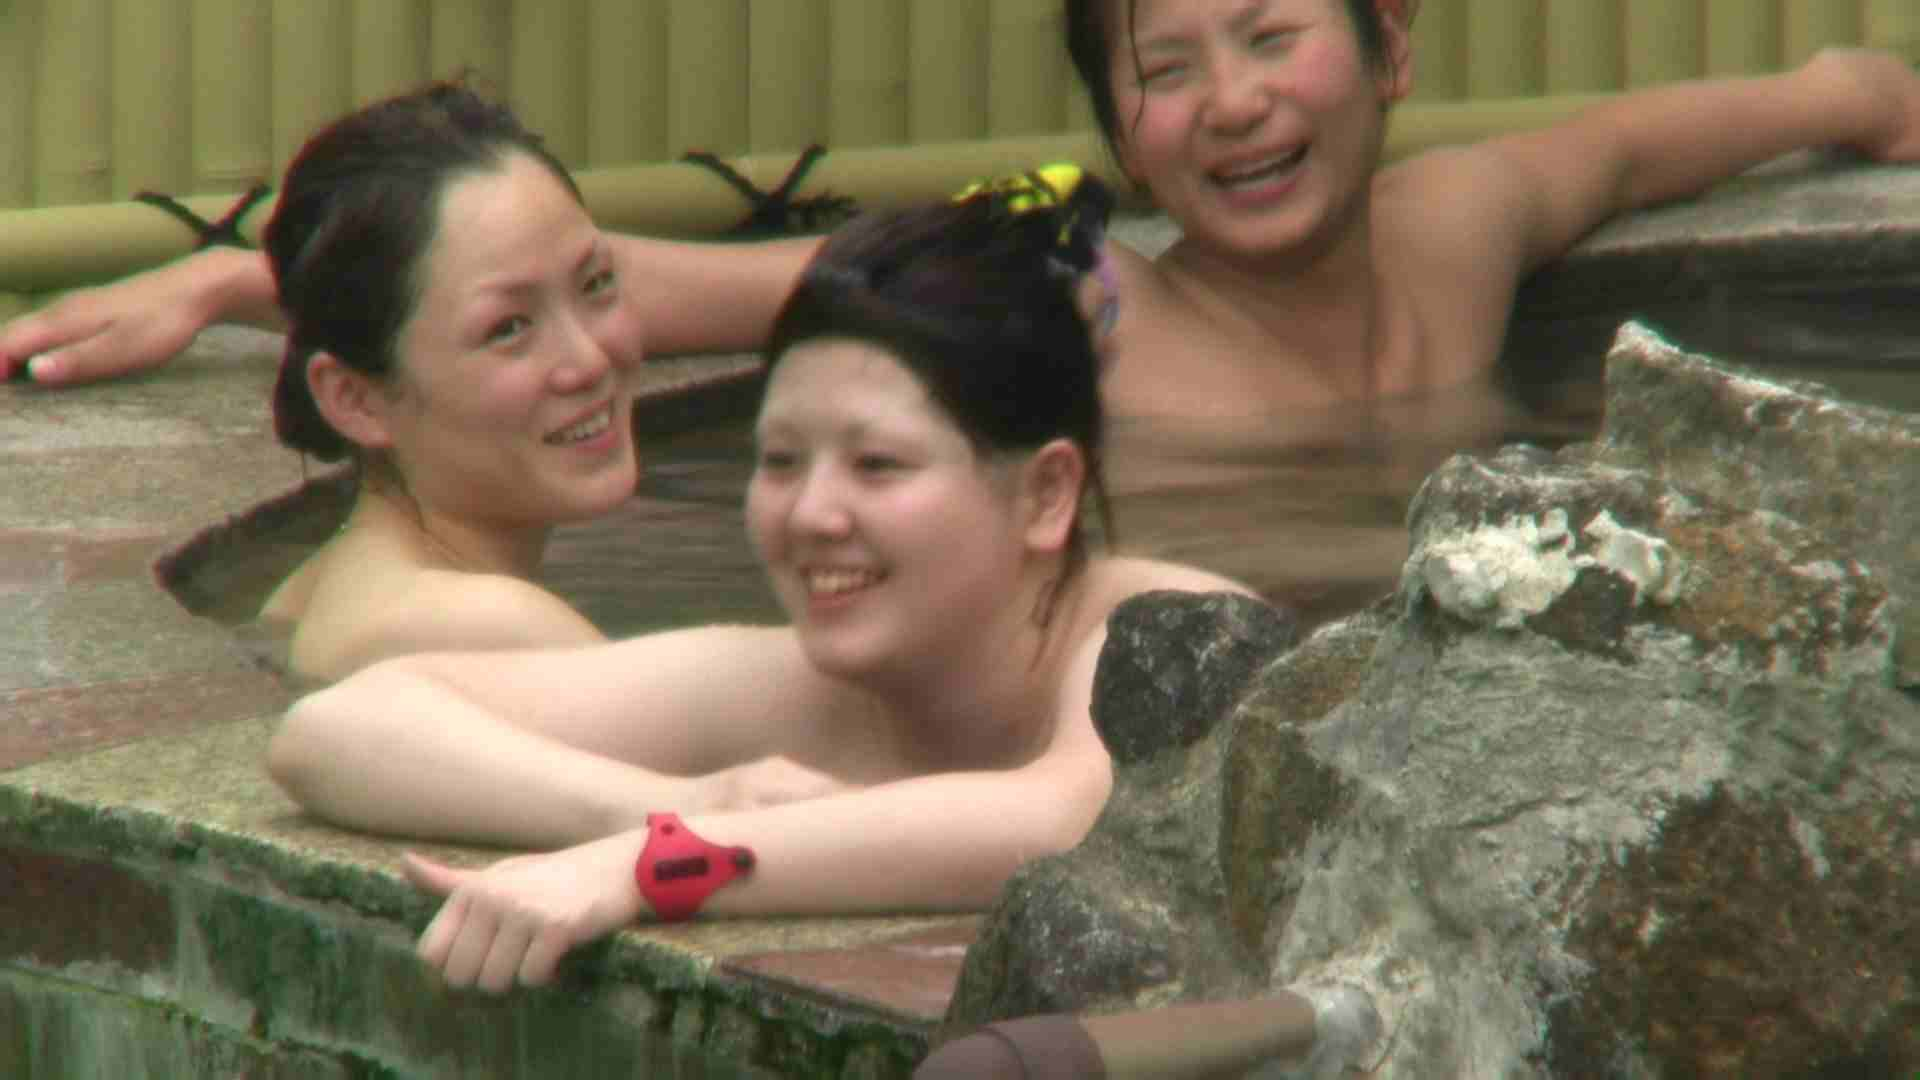 Aquaな露天風呂Vol.66【VIP限定】 OLエロ画像 覗きオメコ動画キャプチャ 74PICs 2